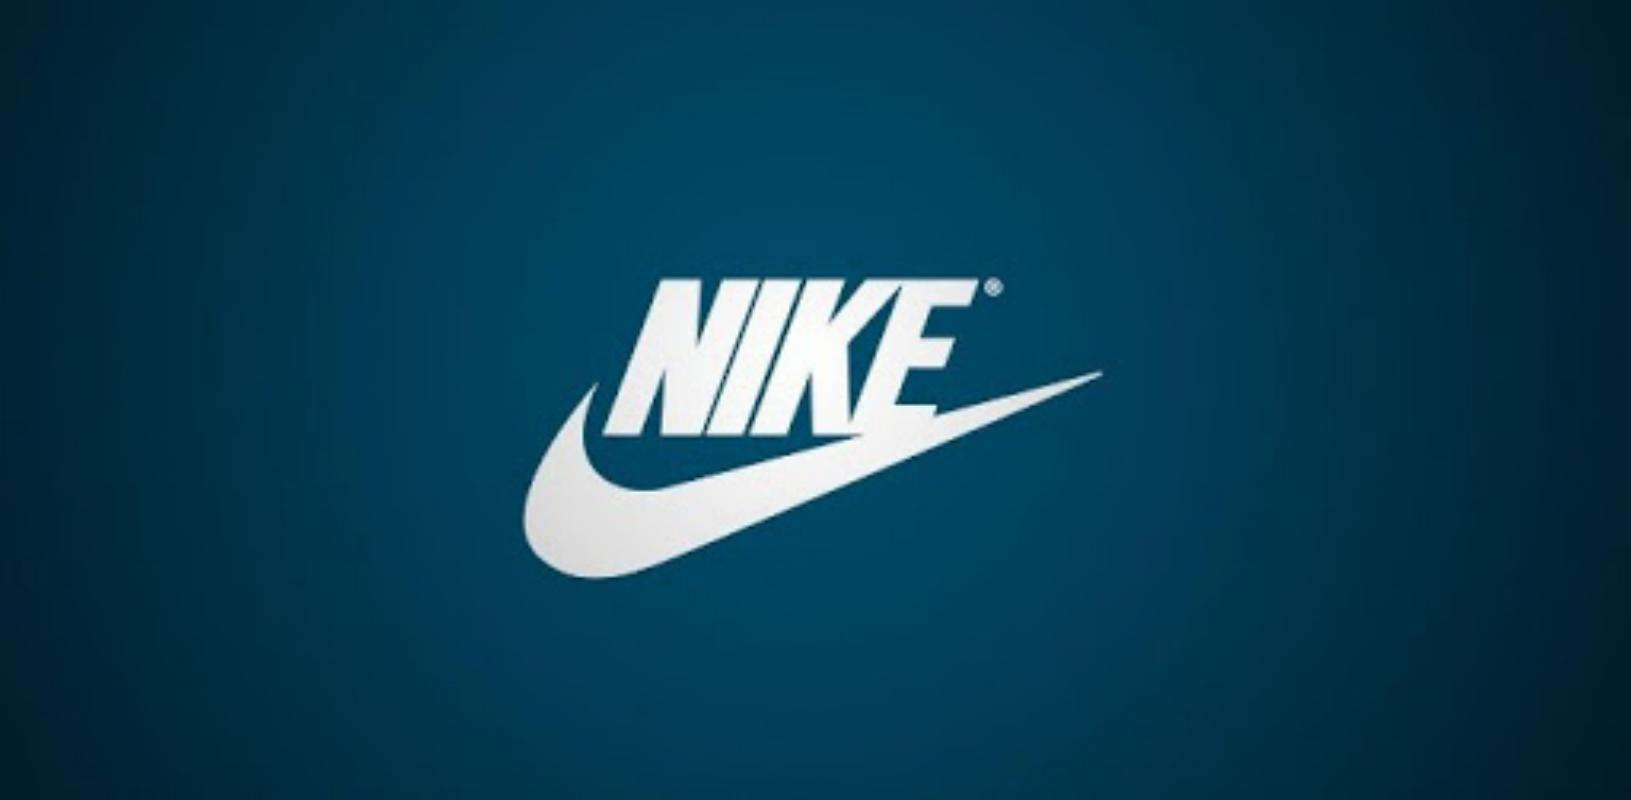 О компаниях Лукойл и Nike во время пандемии